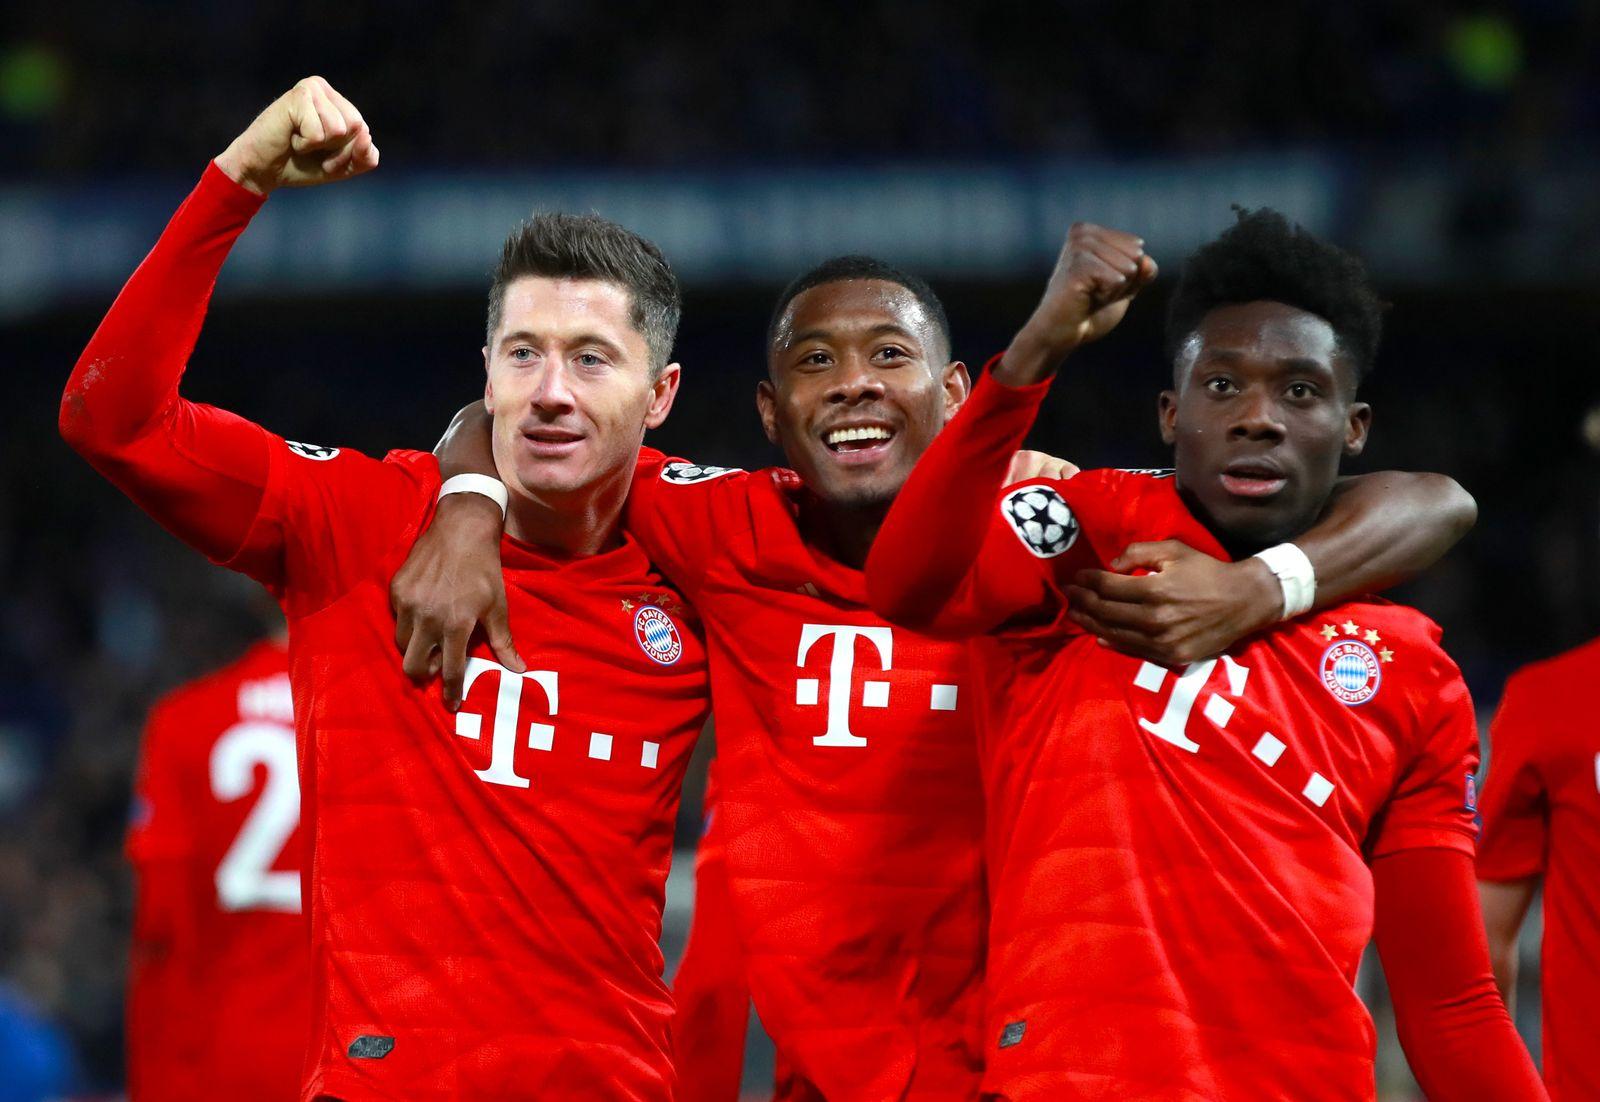 Chelsea v Bayern Munich - UEFA Champions League - Round of 16 - F